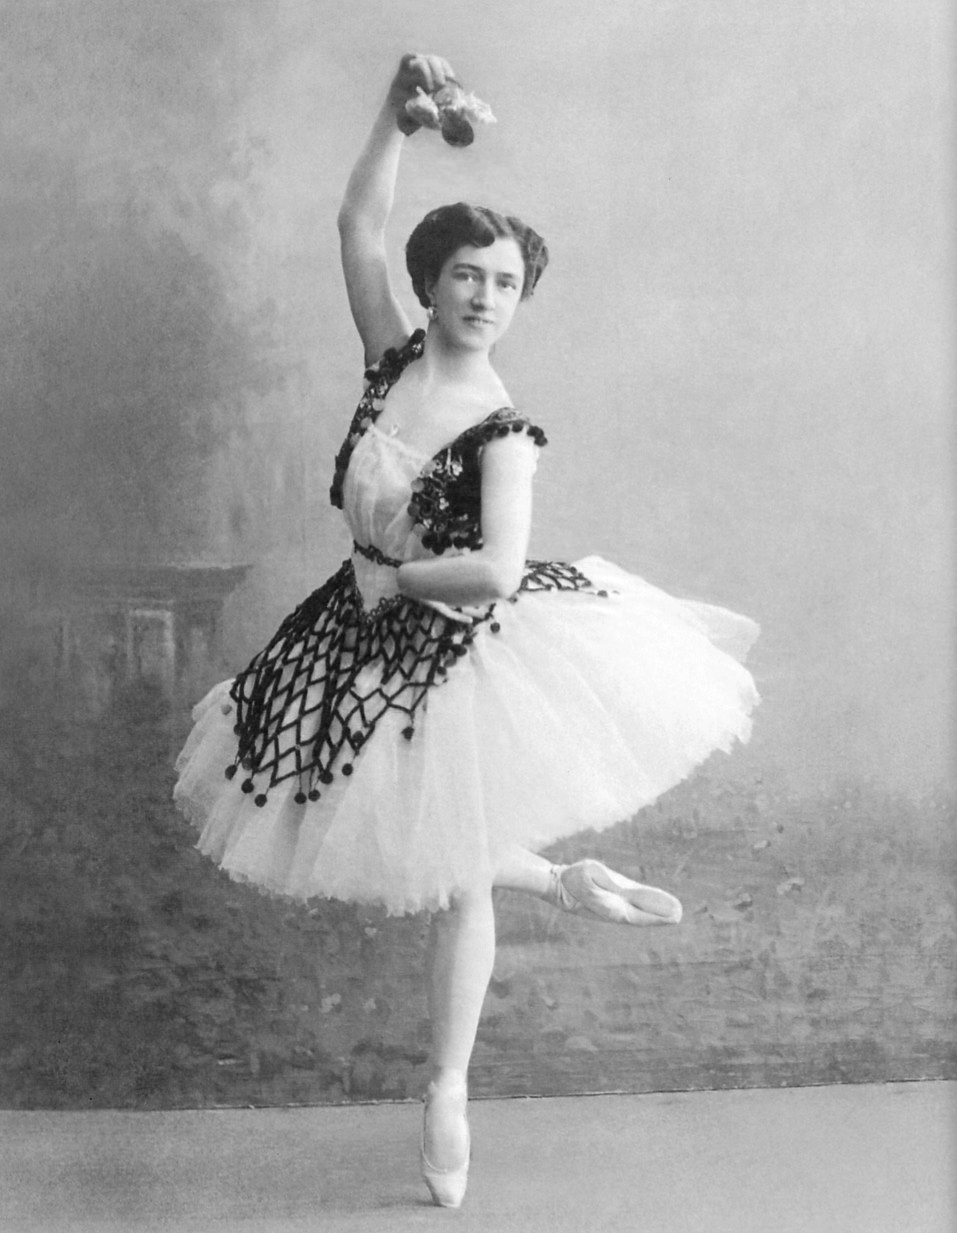 https://upload.wikimedia.org/wikipedia/commons/4/4b/Agrippina_Vaganova_-Esmeralda_1910.jpg